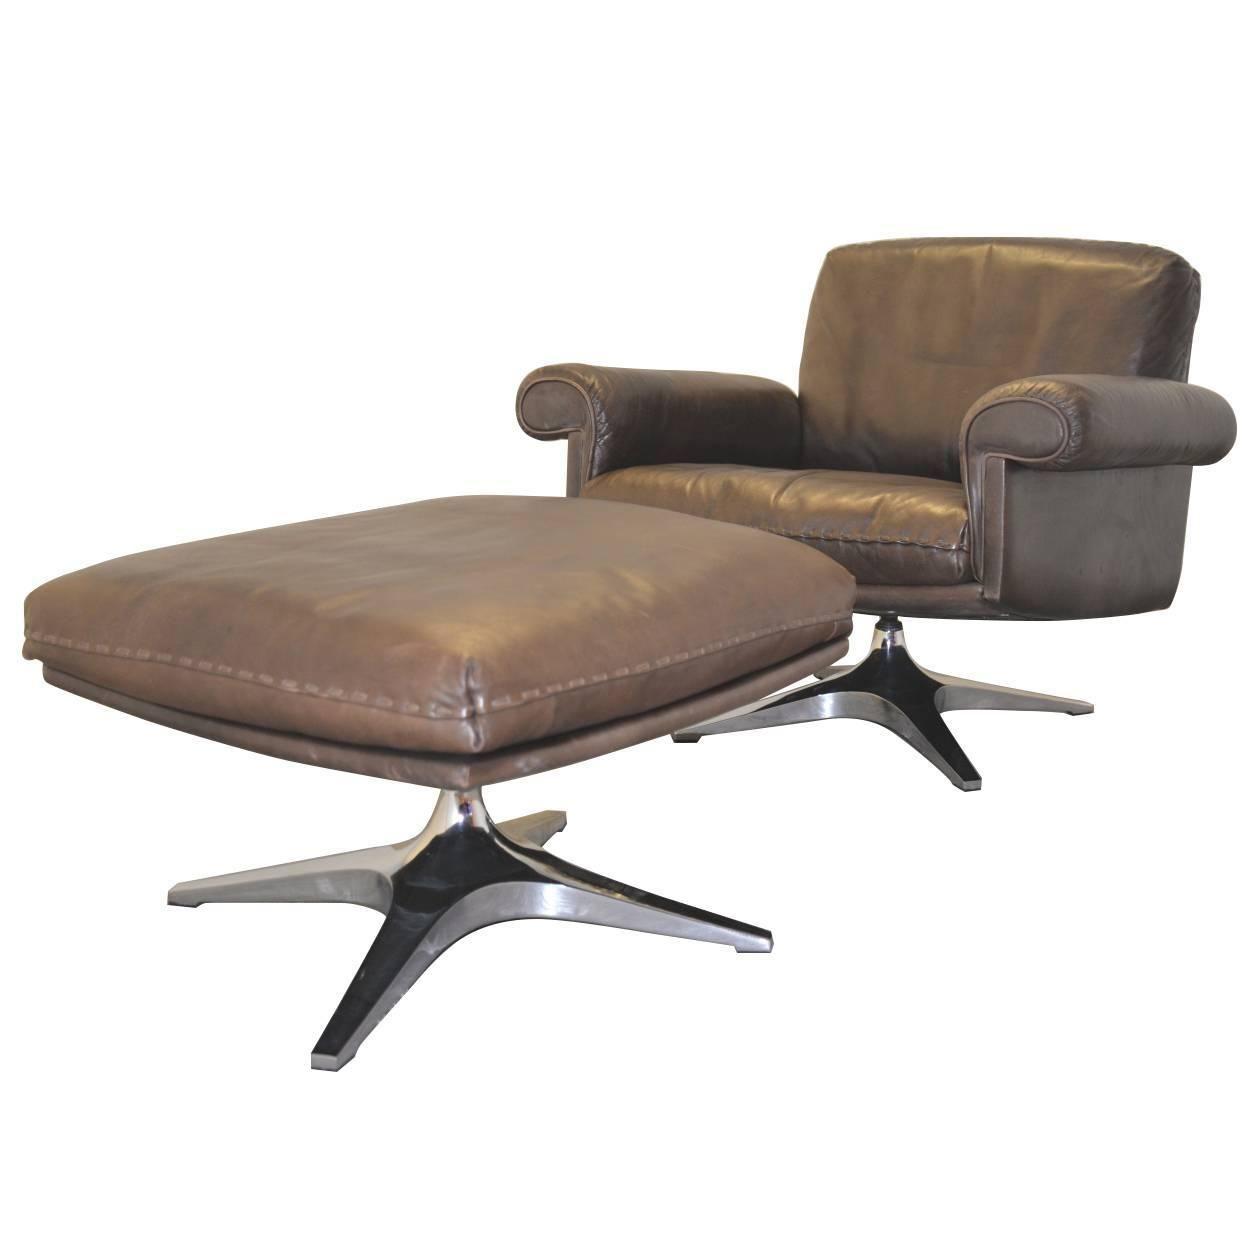 Vintage 1970s De Sede Ds 31 Swivel Lounge Club Armchair And